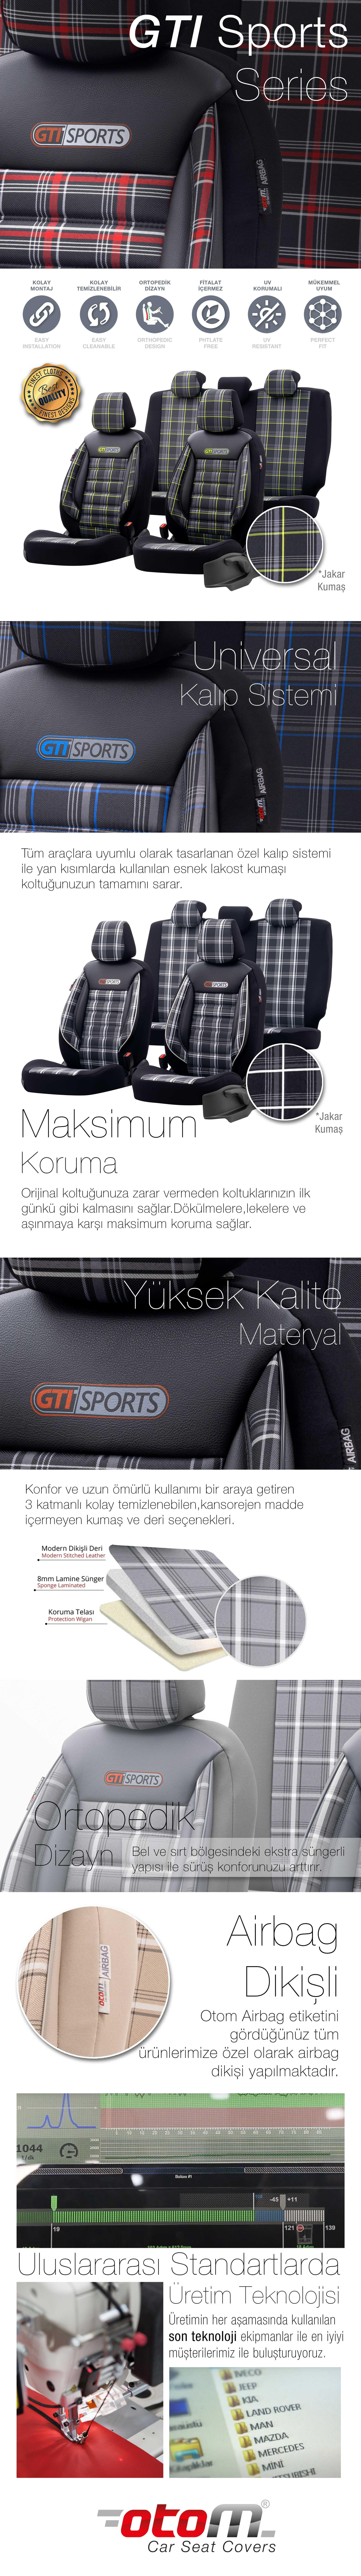 Otom GTI Sports Series Universal Oto koltuk Kılıfı